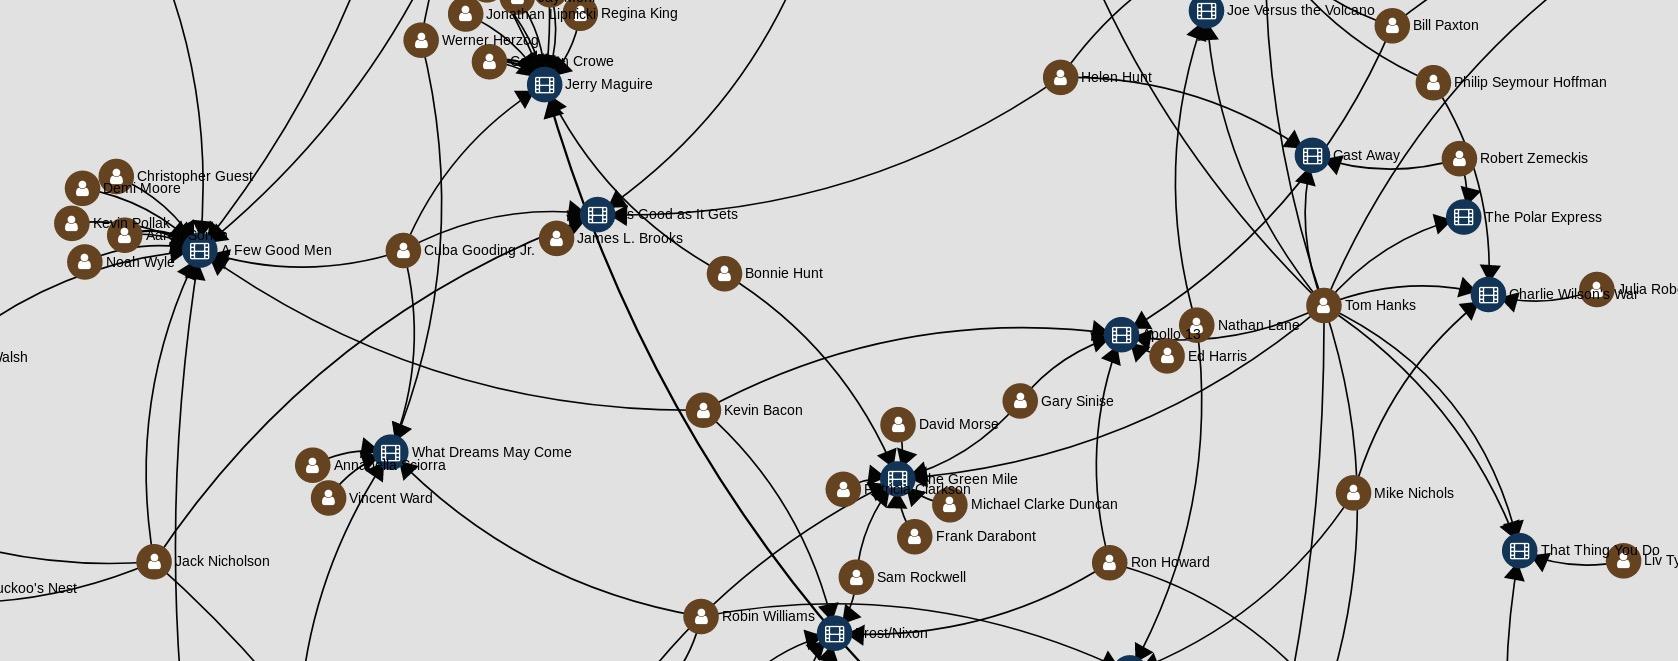 sigmajs visualization